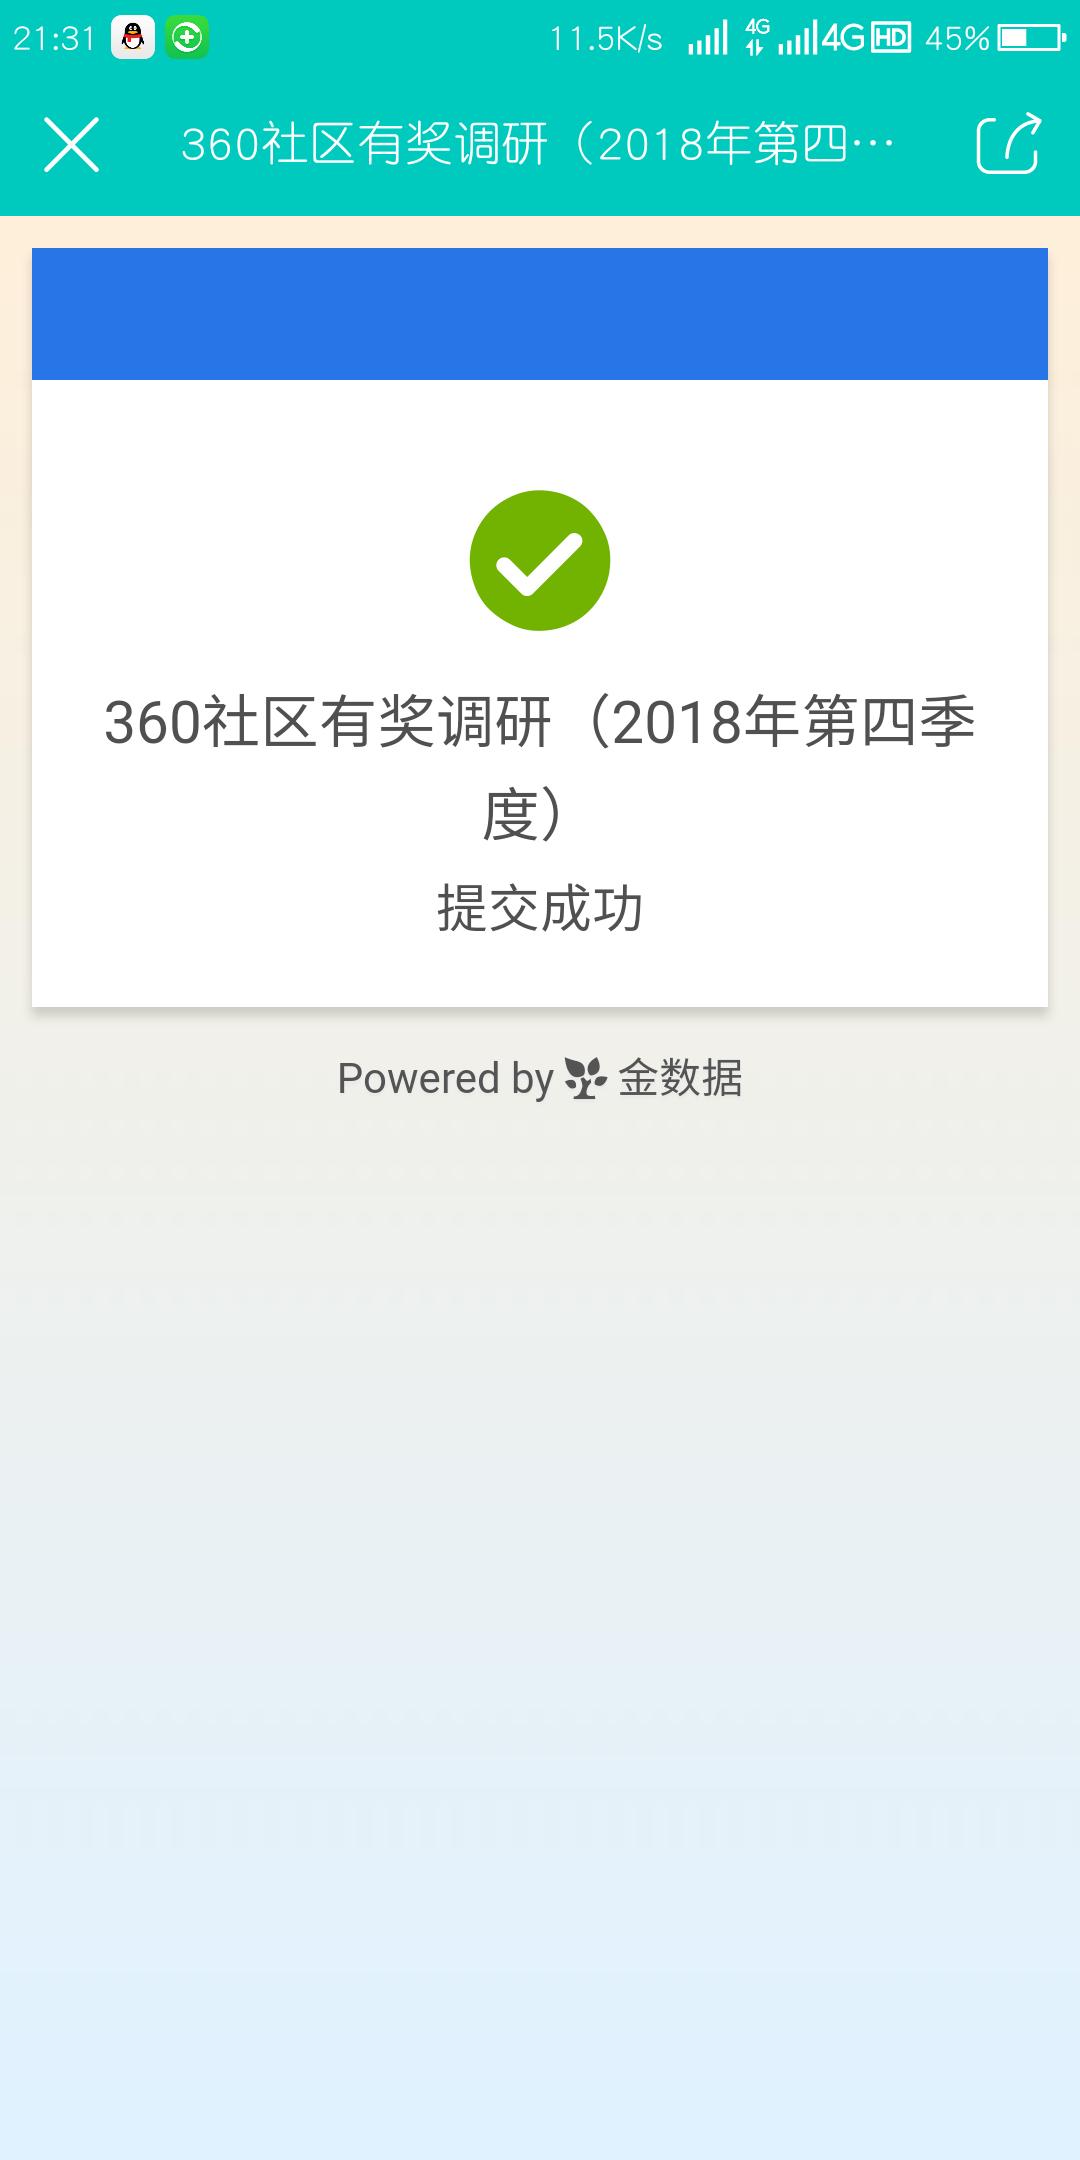 Screenshot_2019-01-04-21-31-10.png